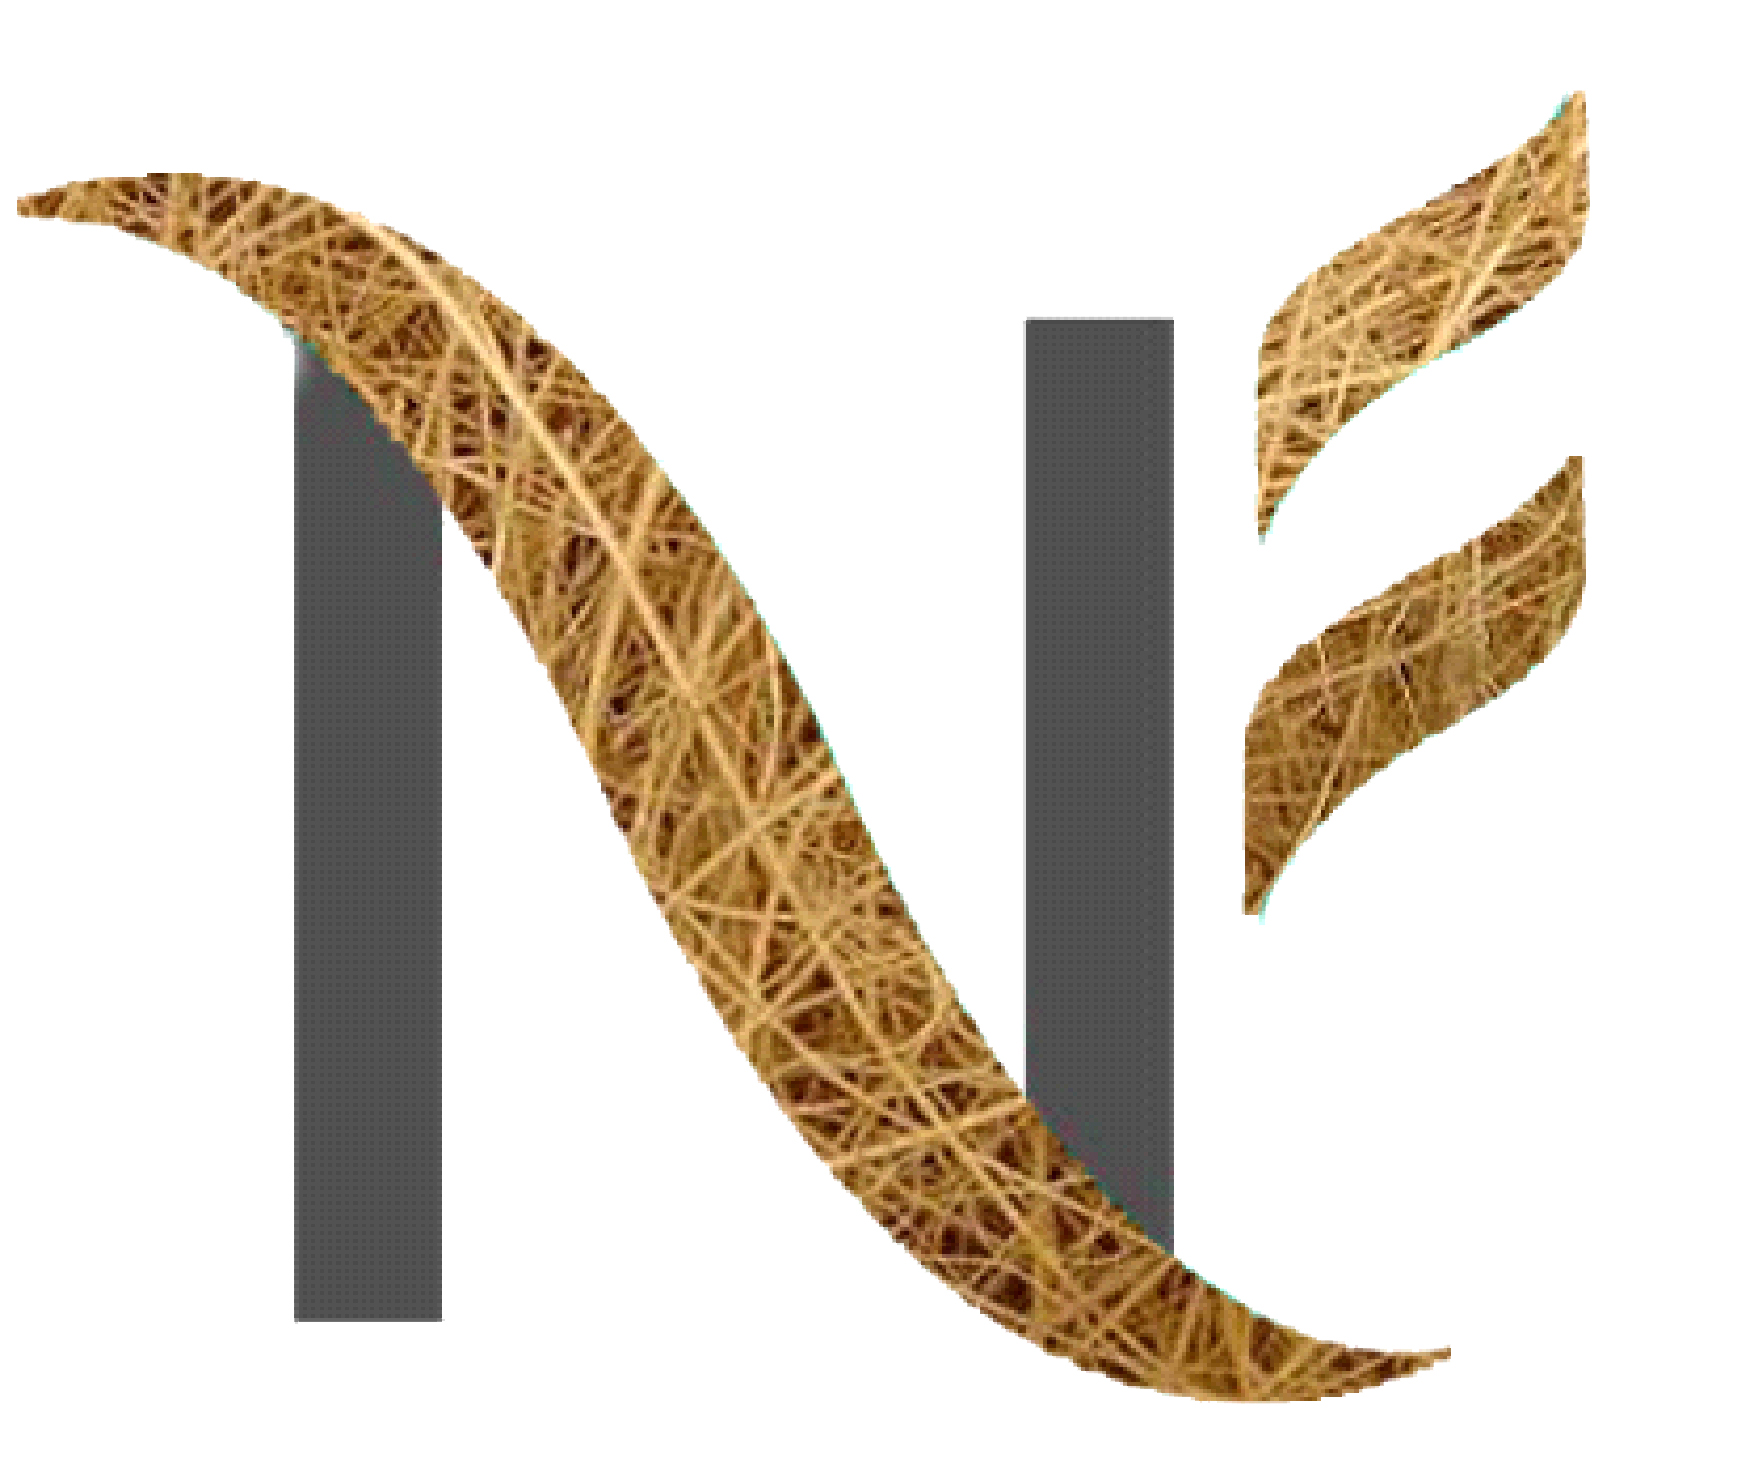 NF Coir Limited